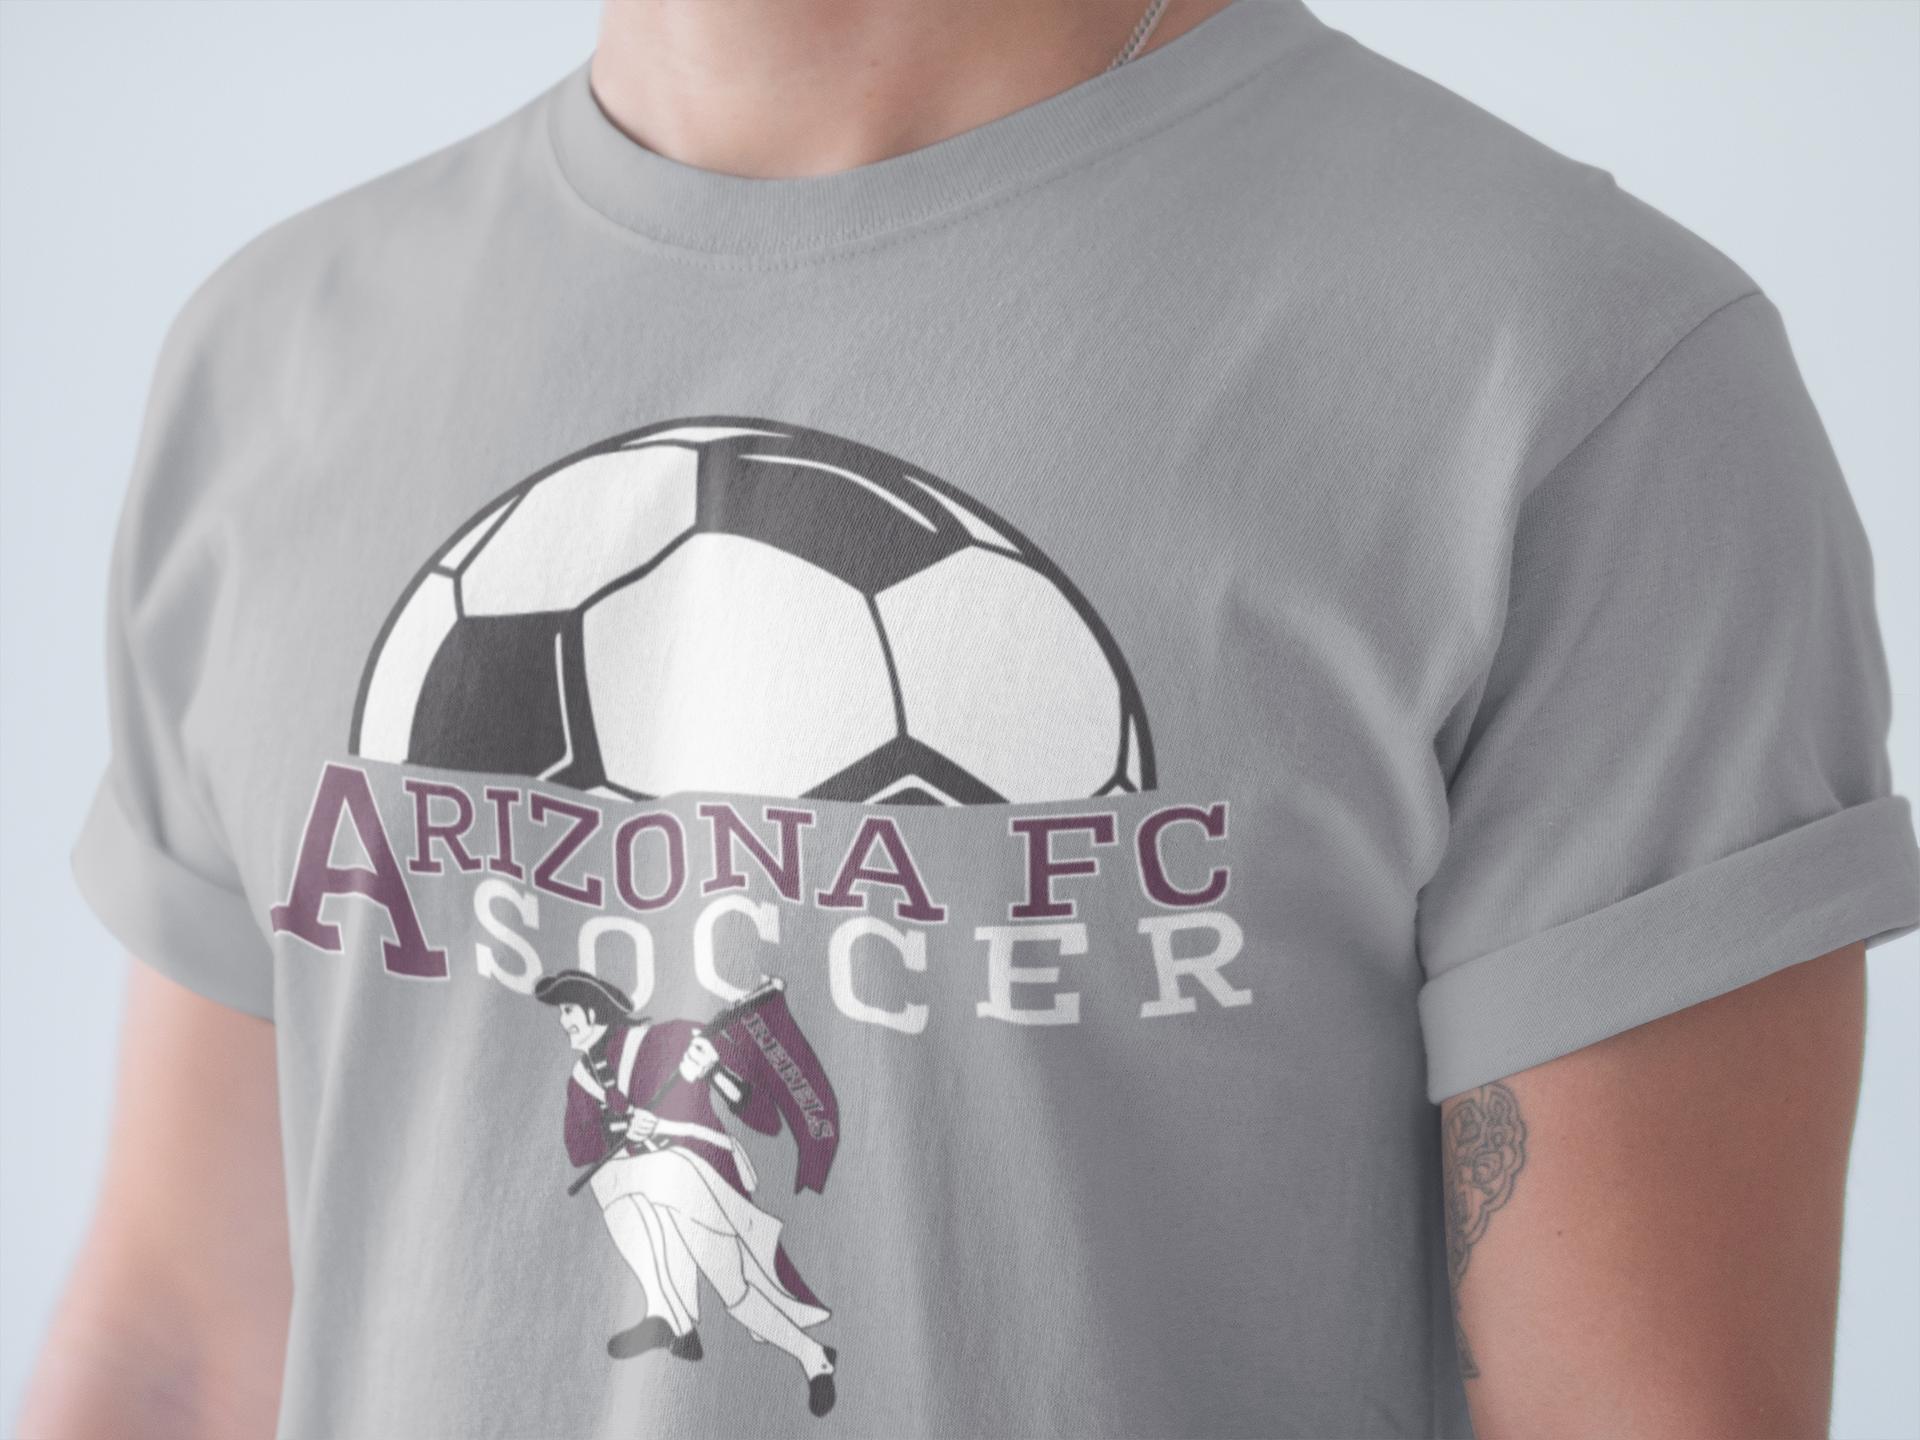 Arizona FC Soccer